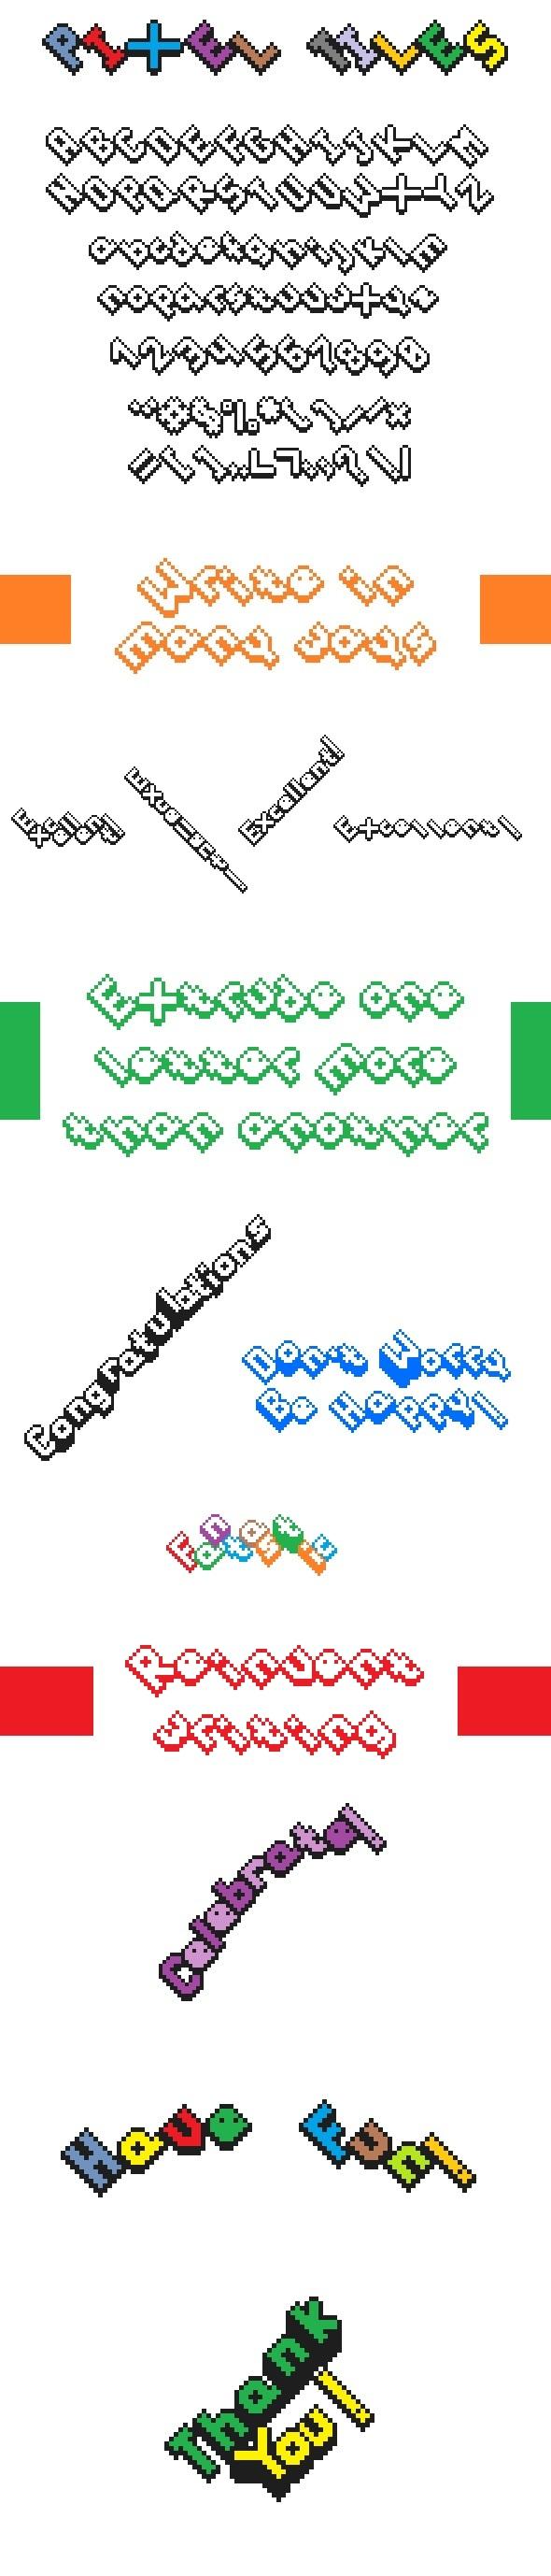 Pixel Tiles - Bitmap & Pixel Decorative